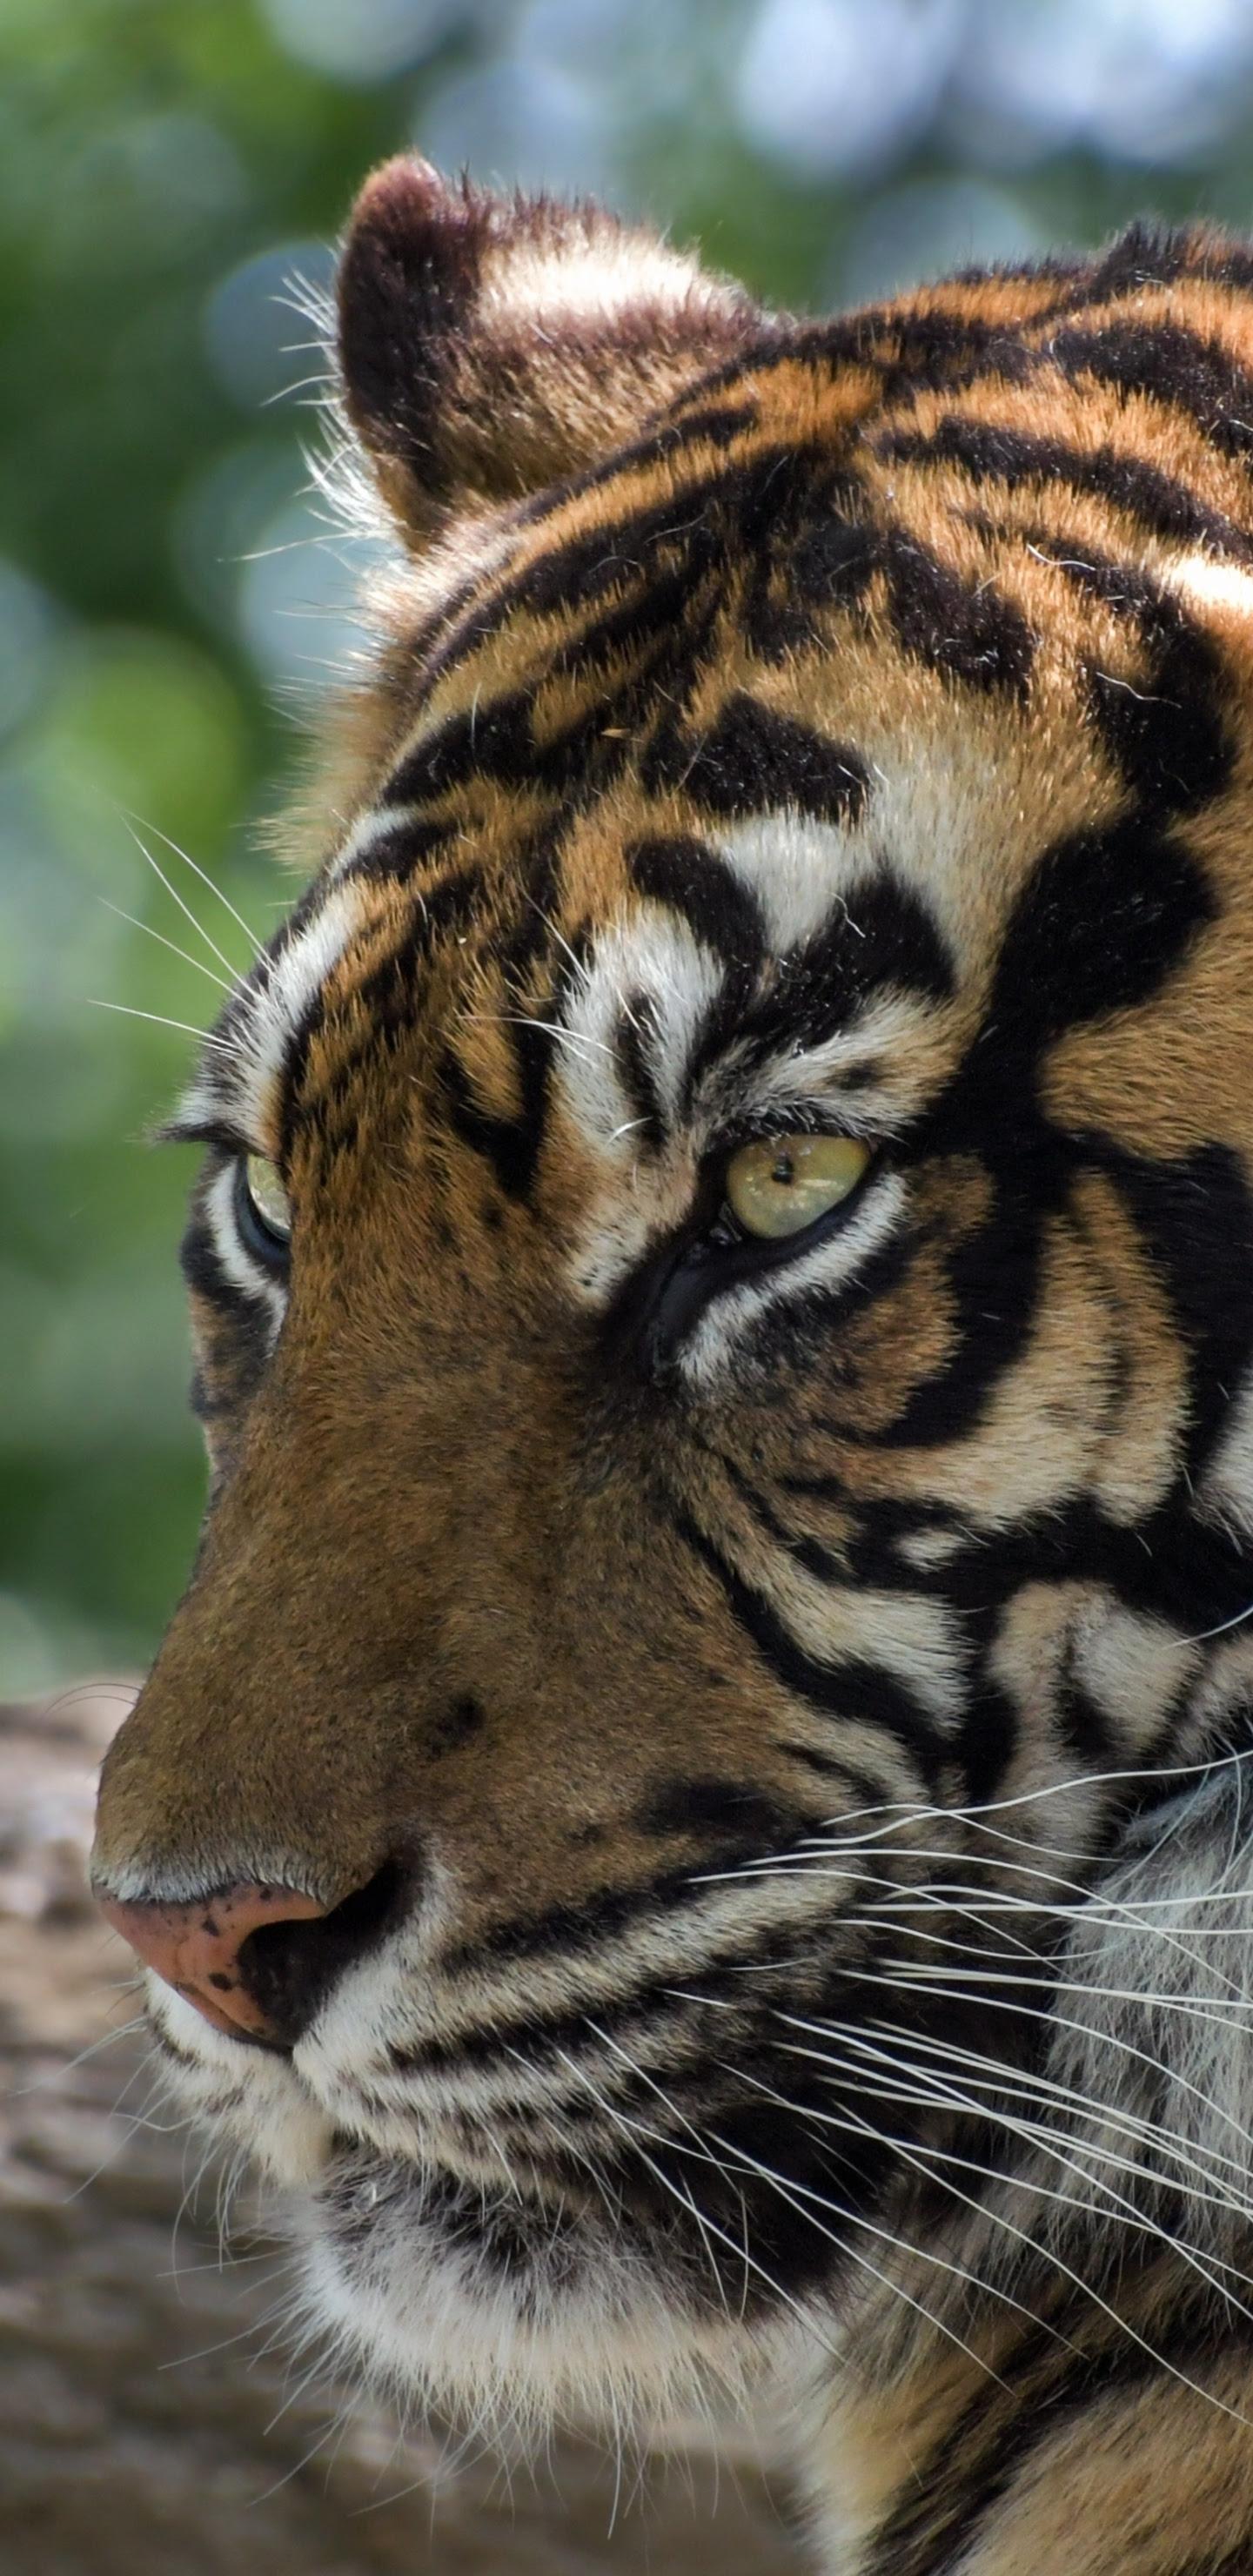 Download 1440x2960 Wallpaper Tiger Furious Animal Muzzle Samsung